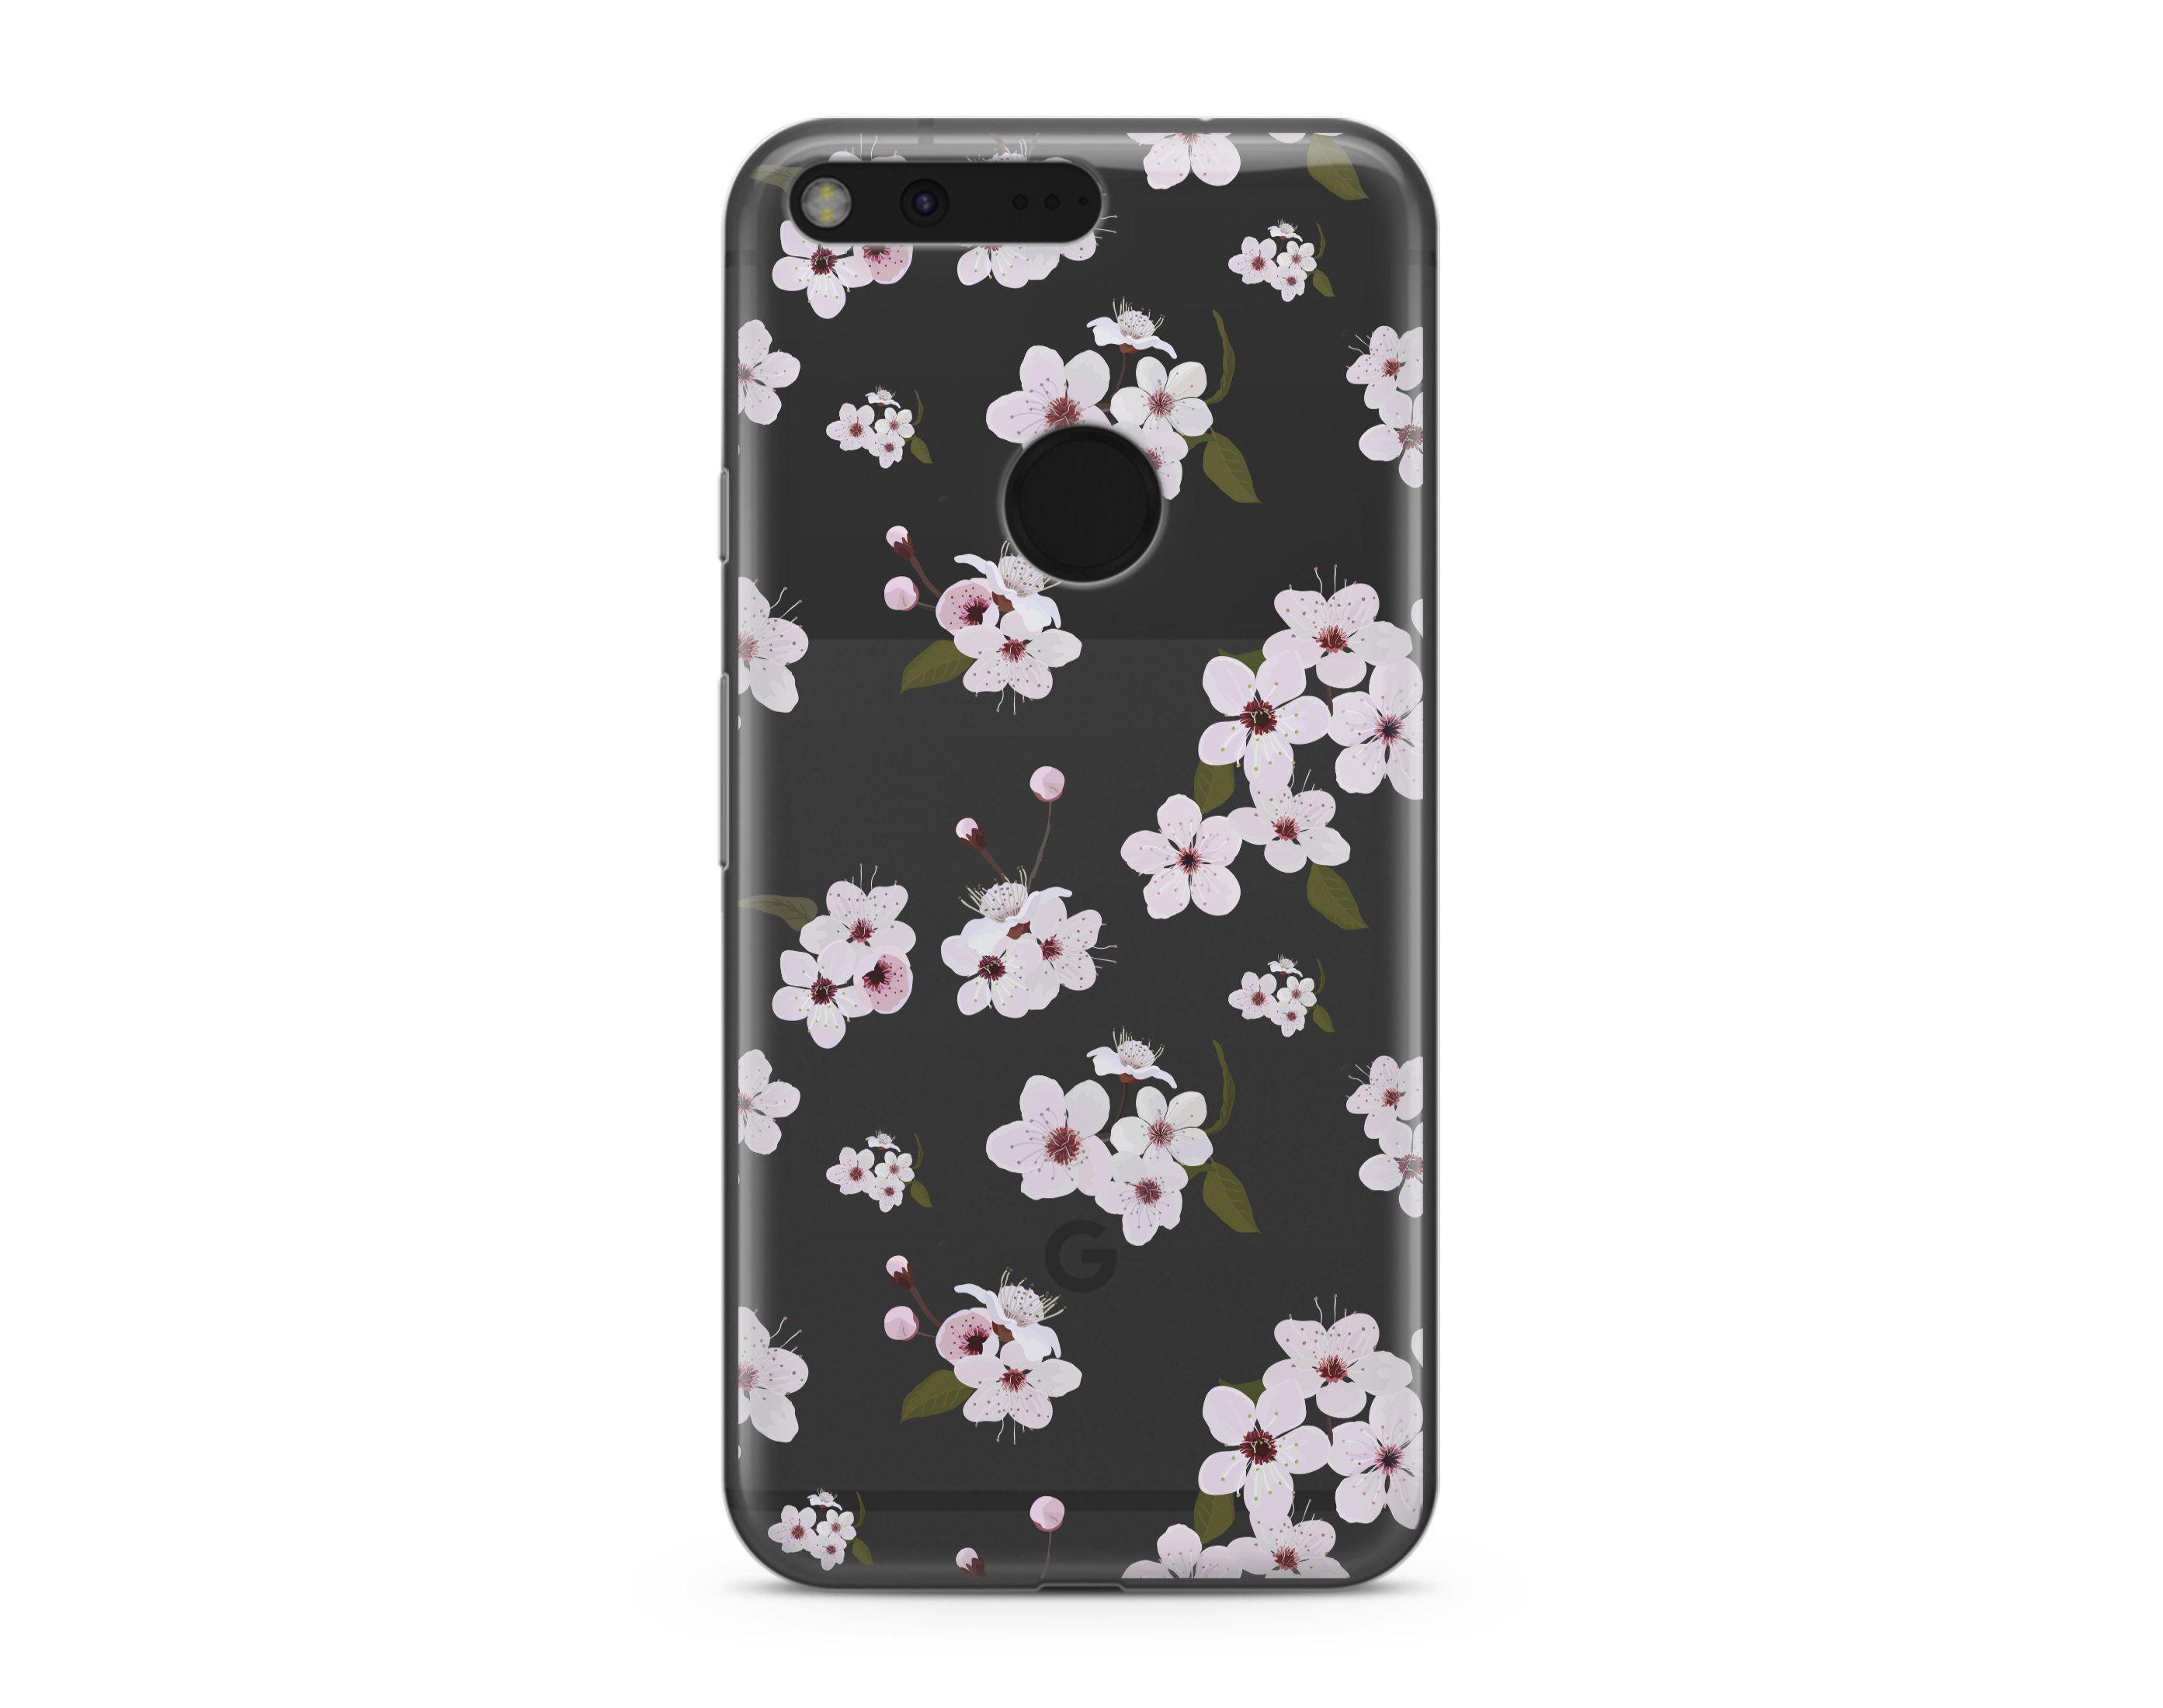 Flower Samsung s9 Plus Case Samsung s6 Edge Cherry iPhone 8 Plus Clear Google Pixel XL